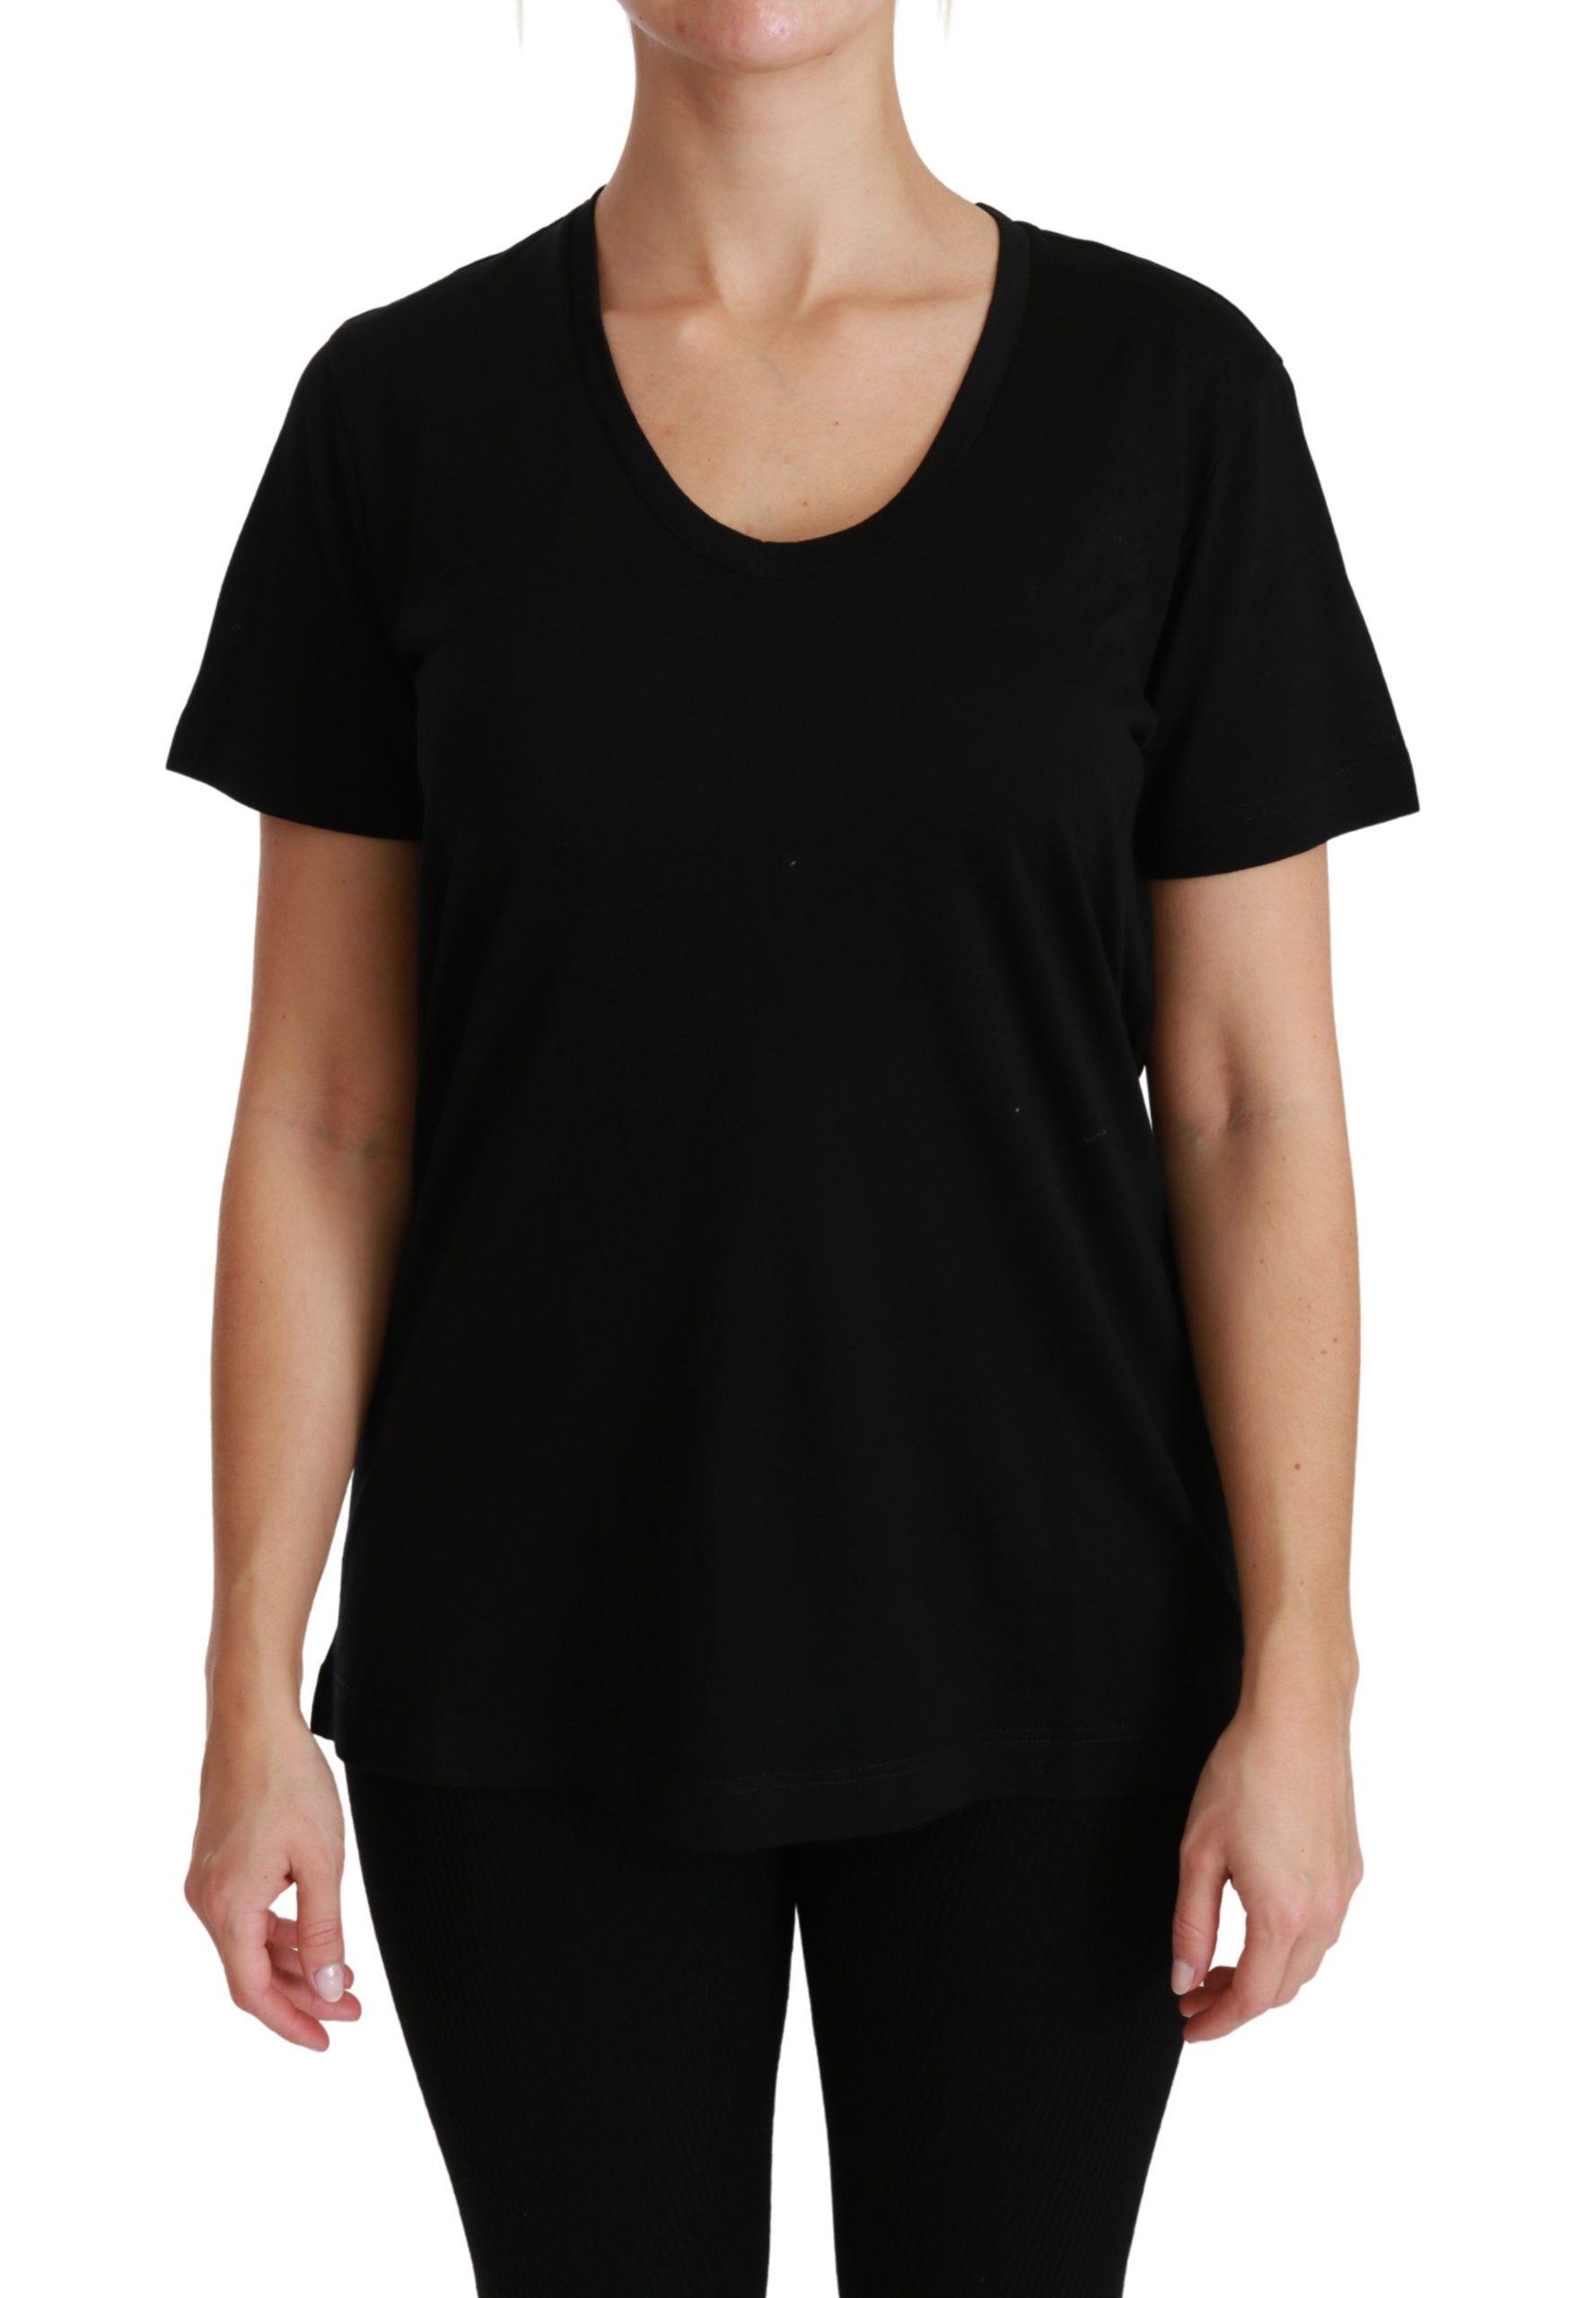 Black U-neck Short Sleeve Top Wool T-shirt - IT46|XL